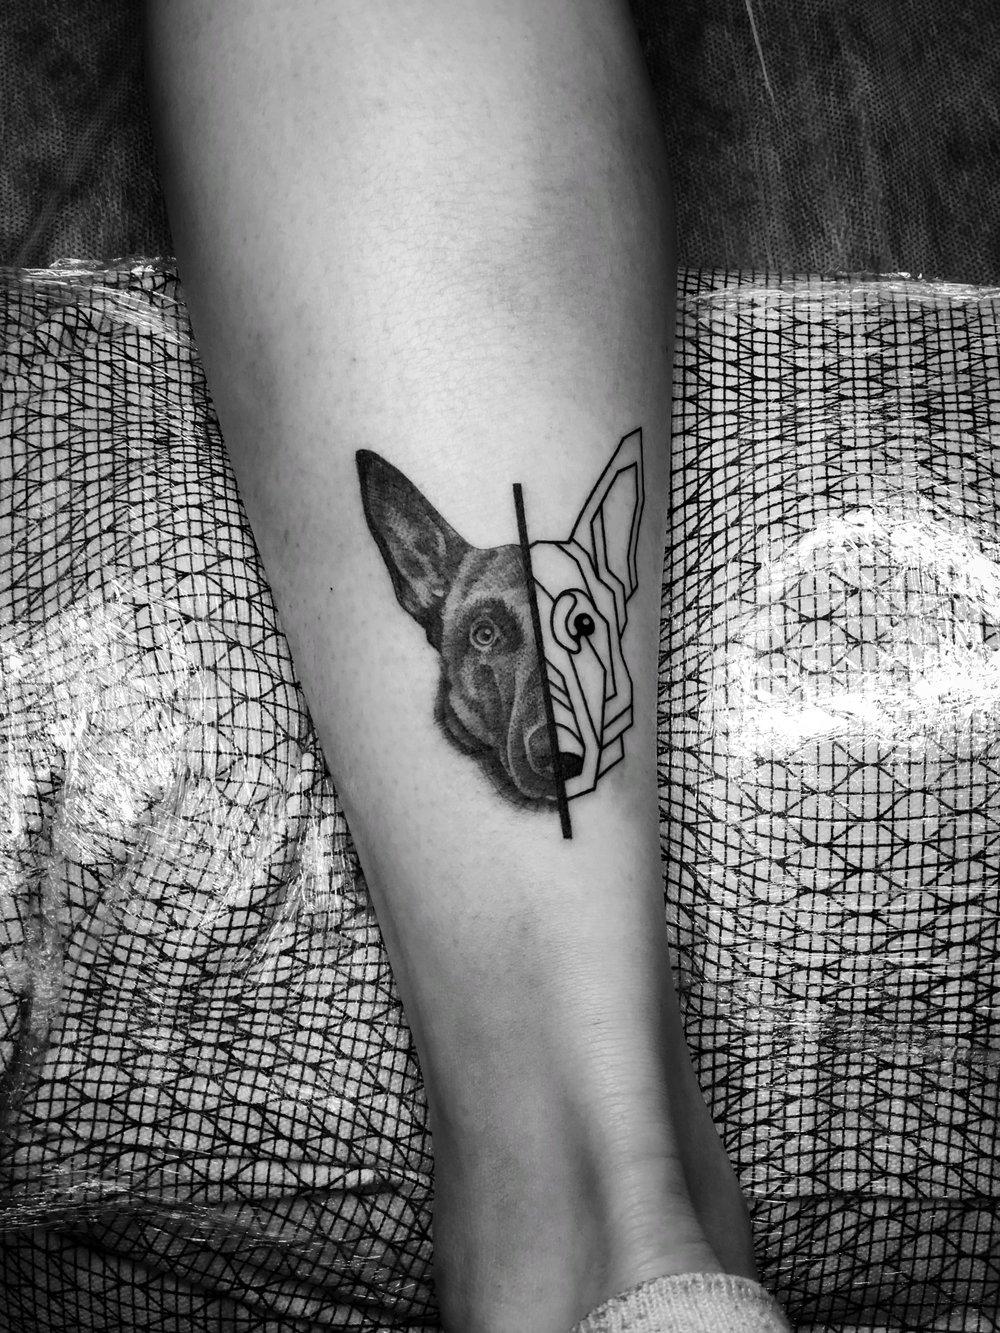 2018-fridays-tattoo-hong-kong-felix-half-dog-geometry-illustration.jpg